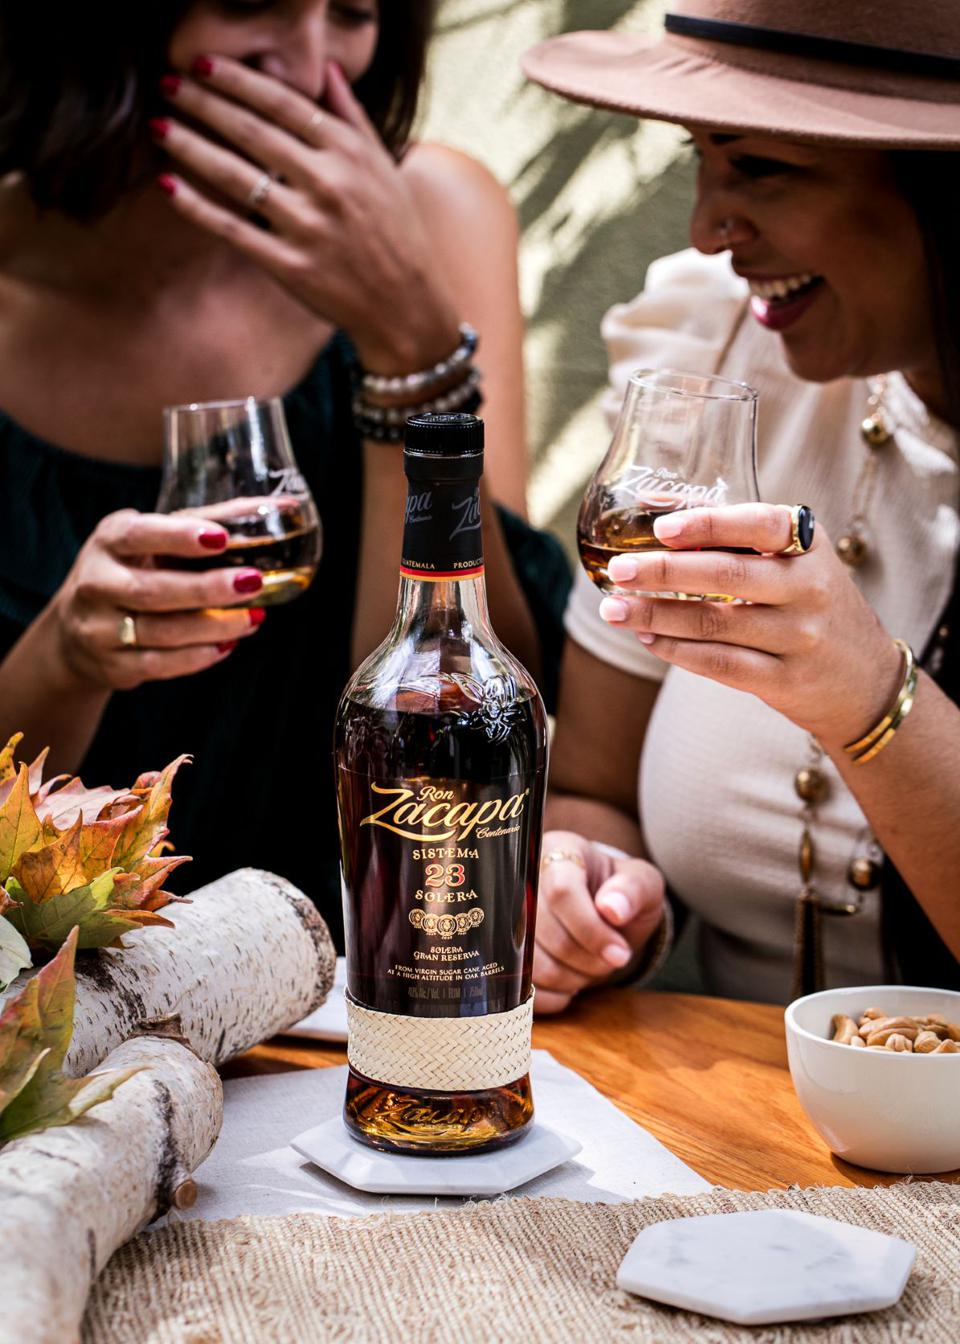 Zacapa 23 Centenario is an aged rum from Guatamala.